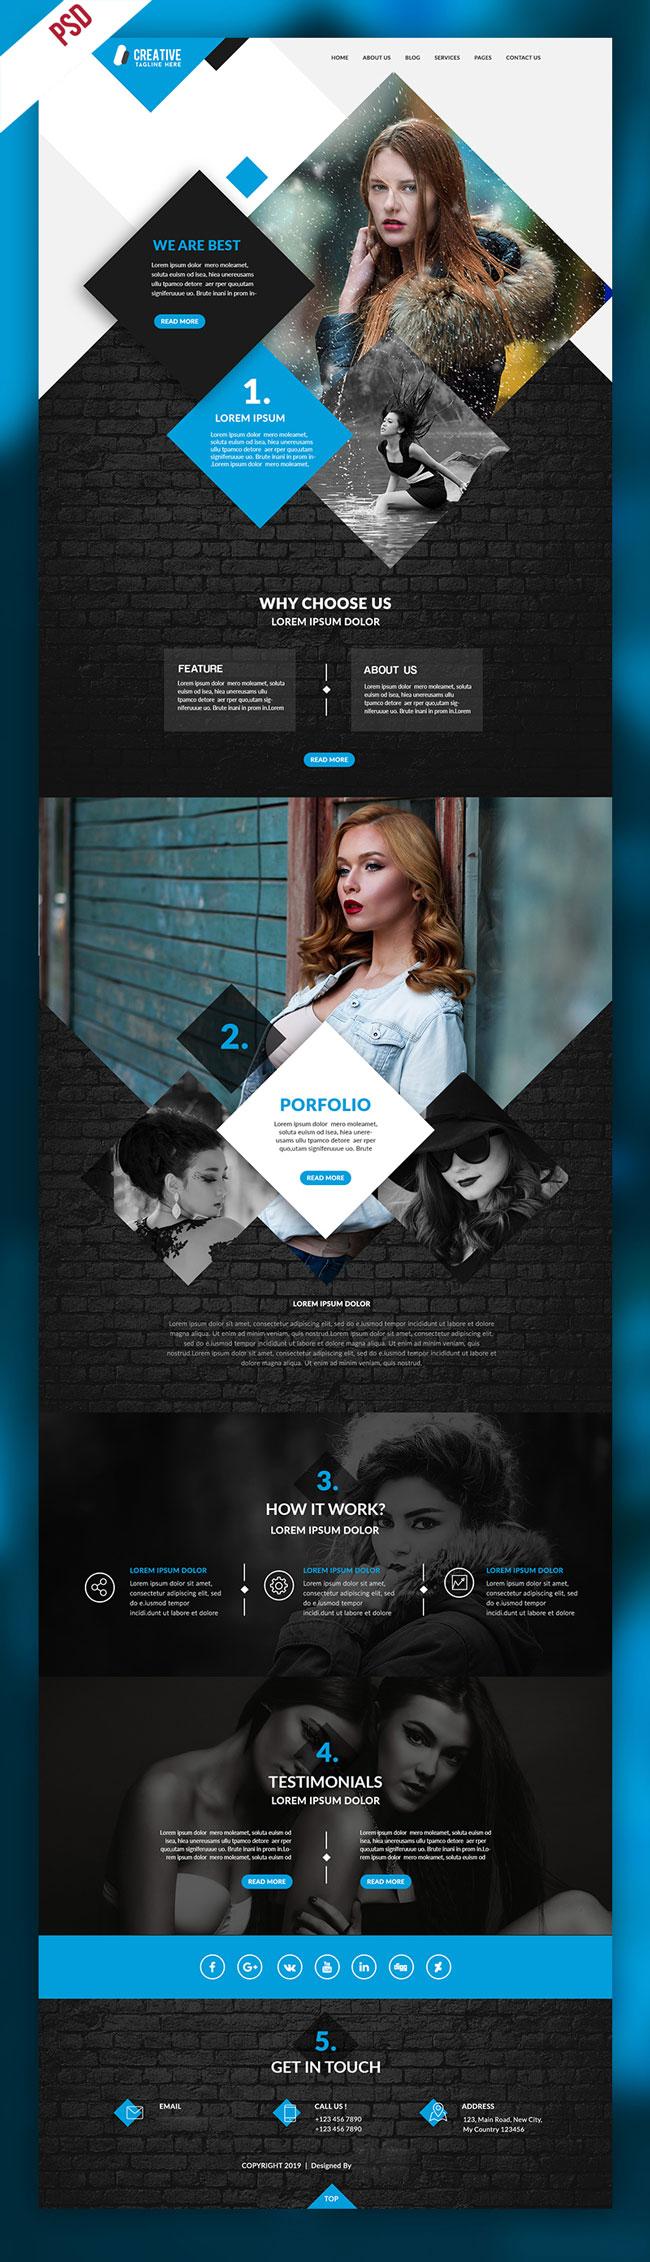 p663 - قالب لایه باز وب سایت زیبایی و پوشاک تک صفحه ای